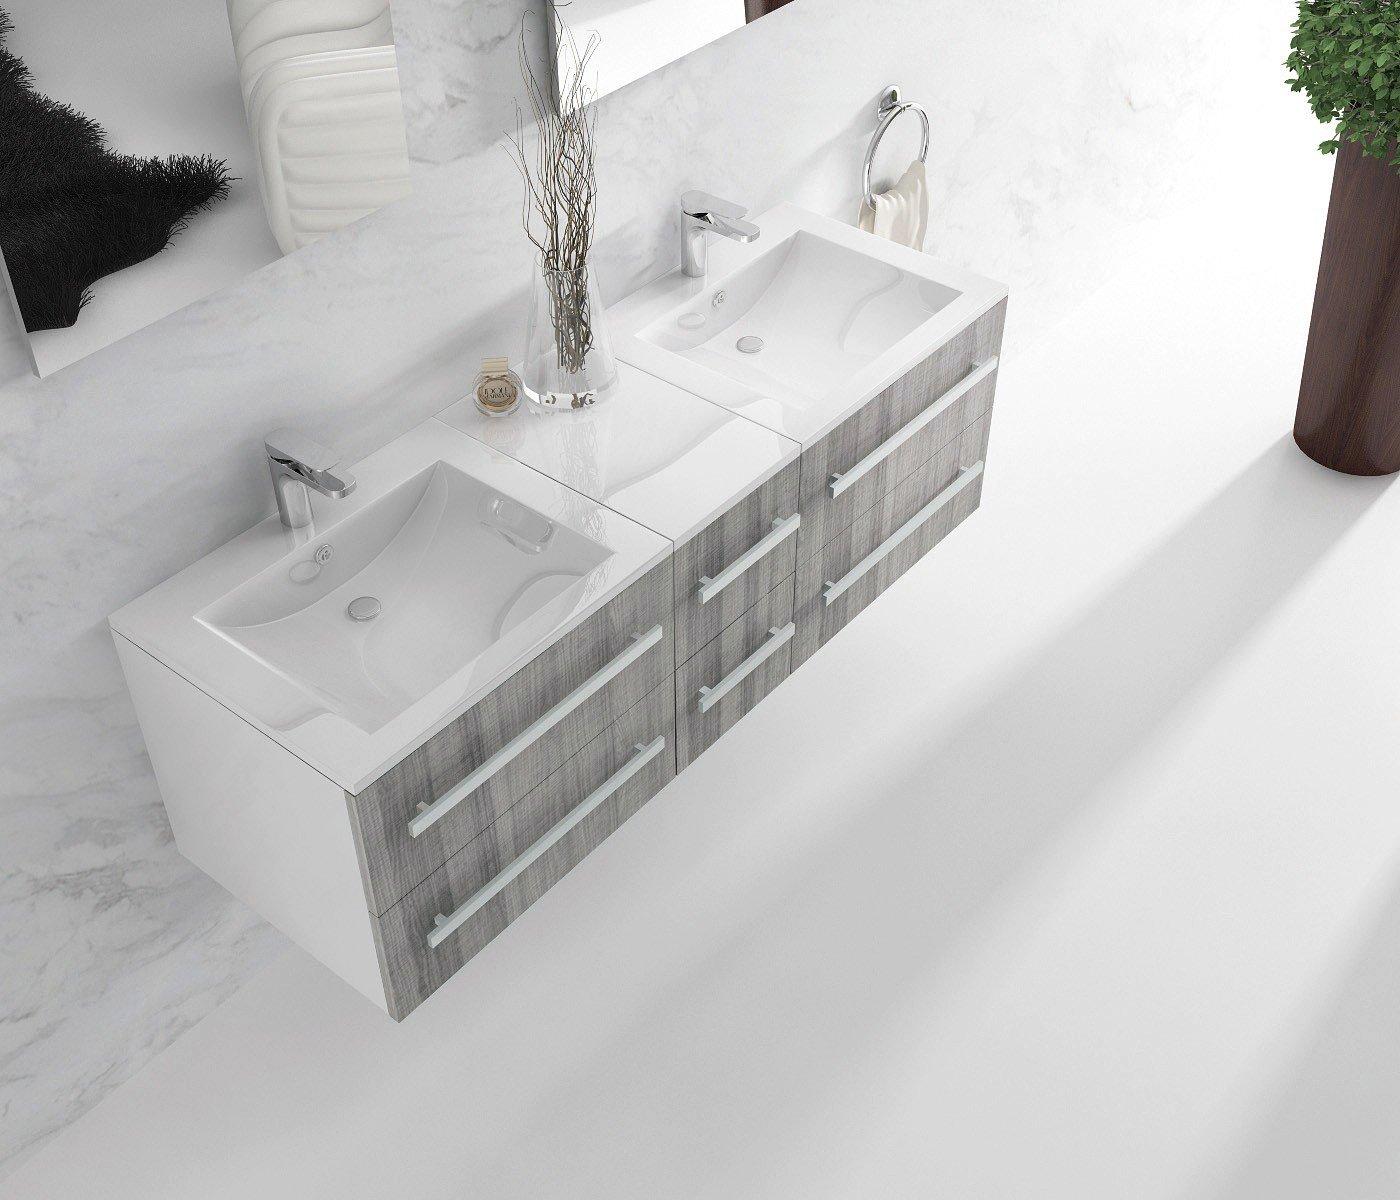 awesome meuble salle de bain un vasque avec 2 mitigeurs images awesome interior home. Black Bedroom Furniture Sets. Home Design Ideas